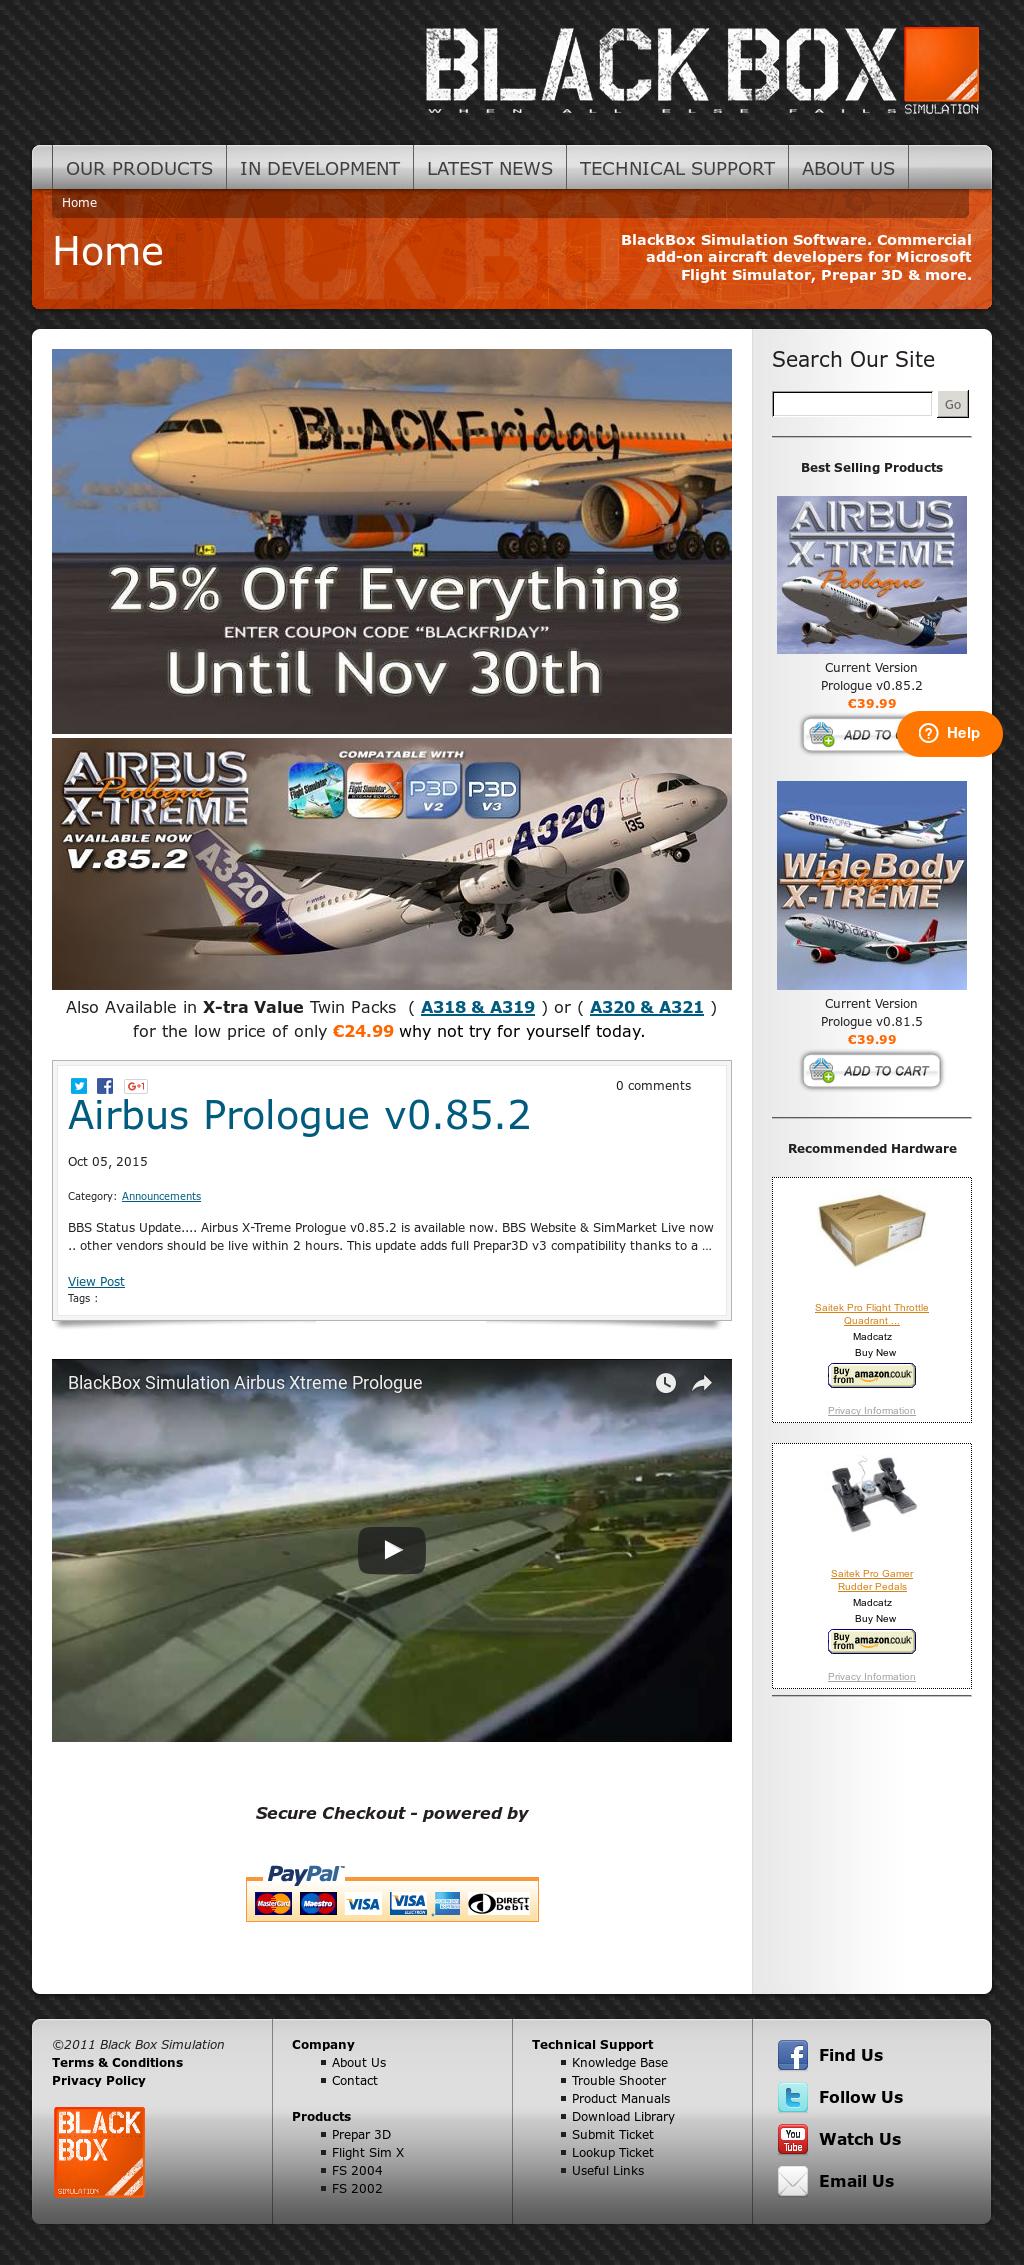 Owler Reports - Black Box Simulation Blog Airbus Prologue v0